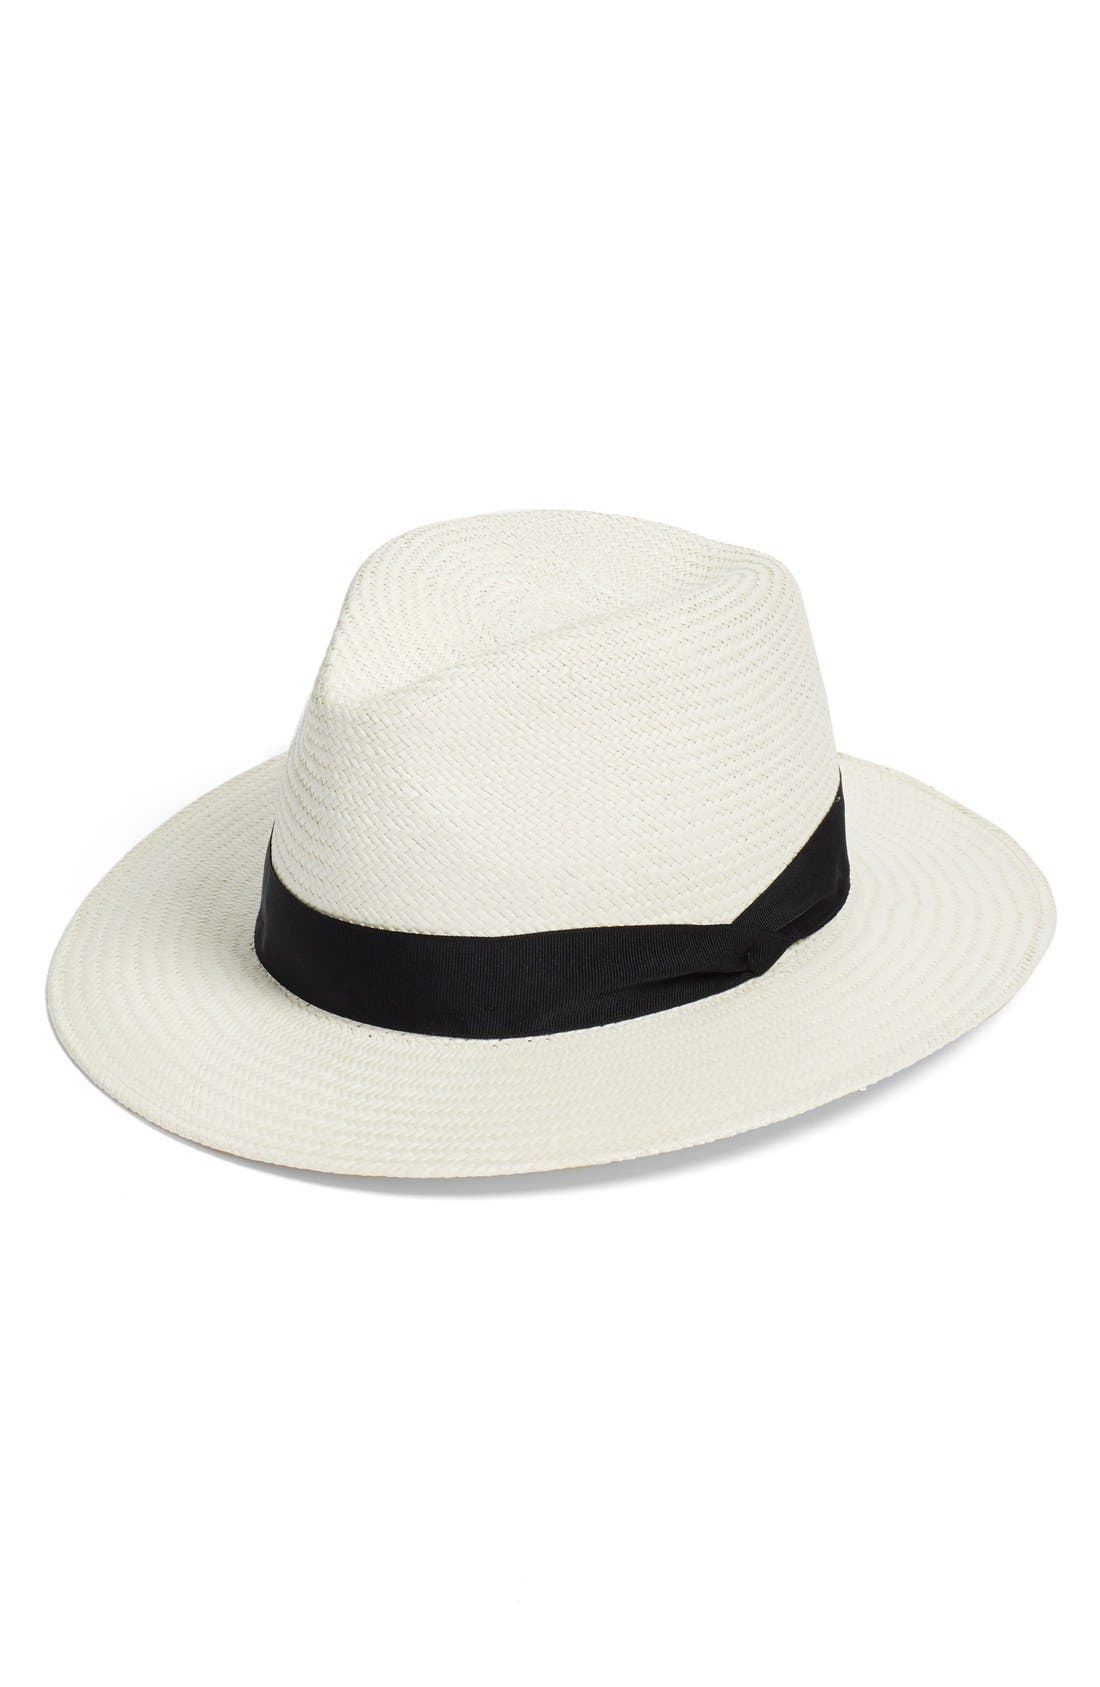 Straw Panama Hat,                         Main,                         color,